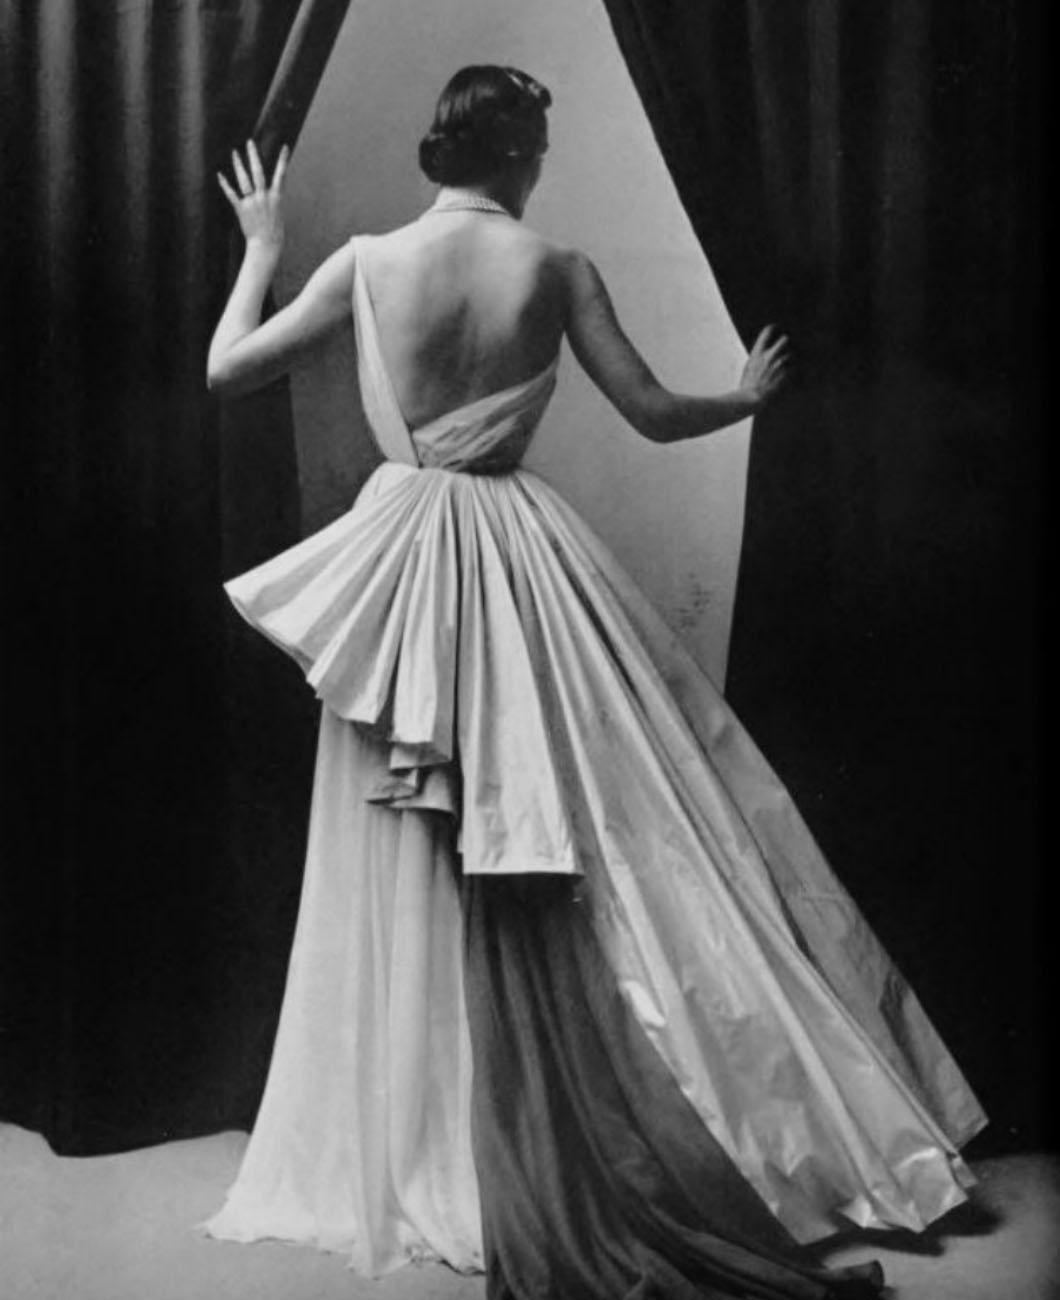 madame-gres-la-polo-lapolo-drape-draping-styles-fashion-vintage-fad-trend-bold